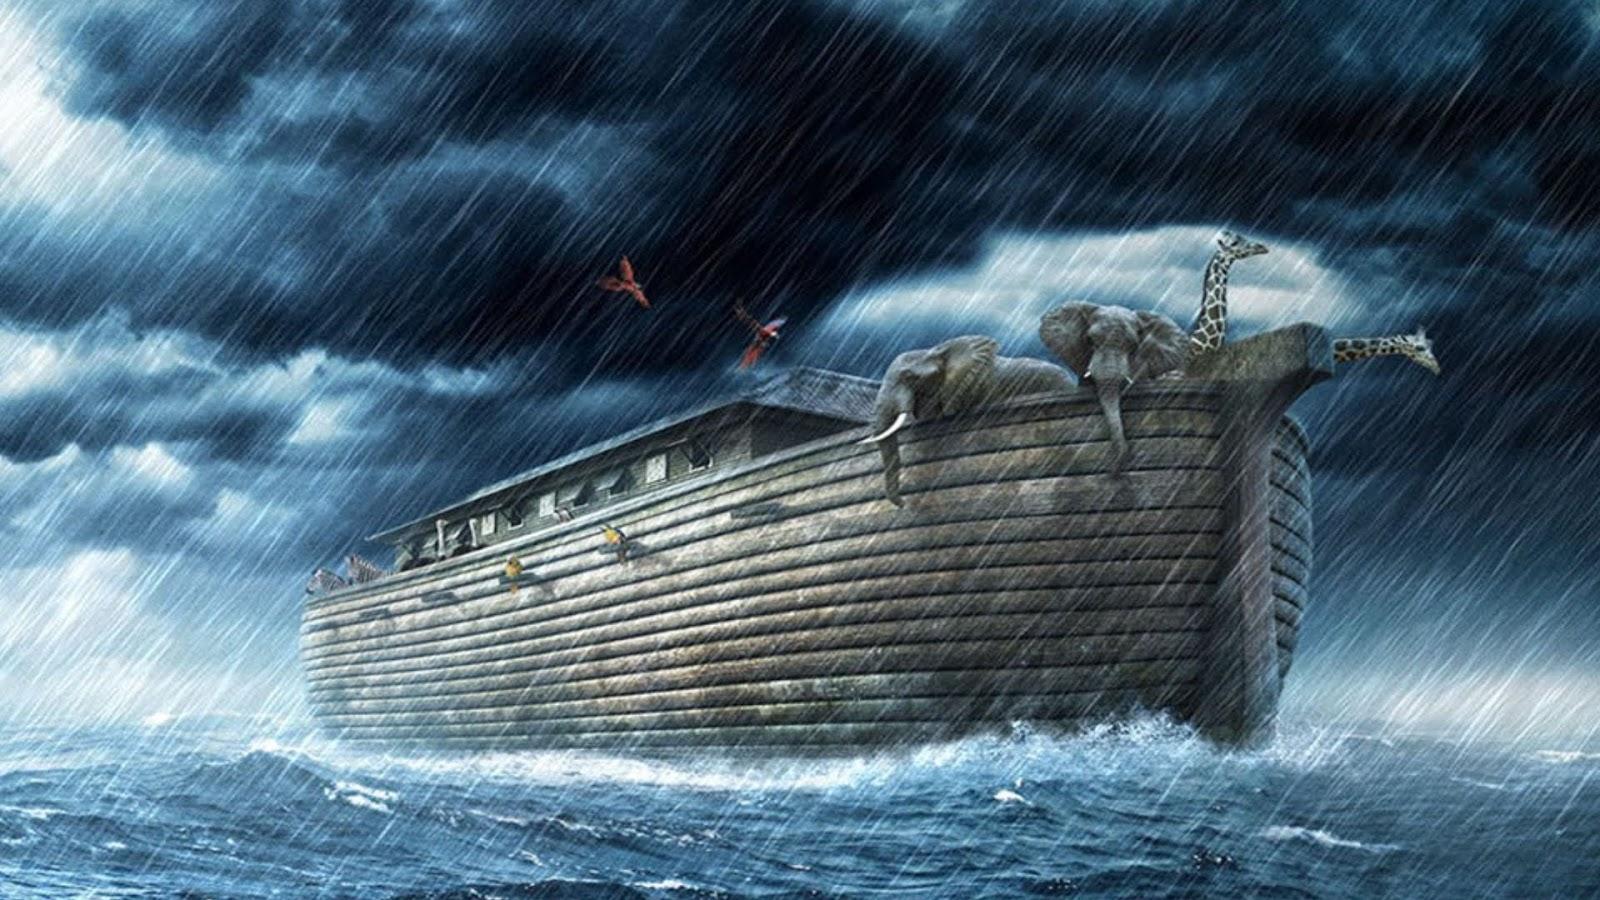 kisah-nabi-nuh-lengkap-dan-mukjizat-nabi-nuh